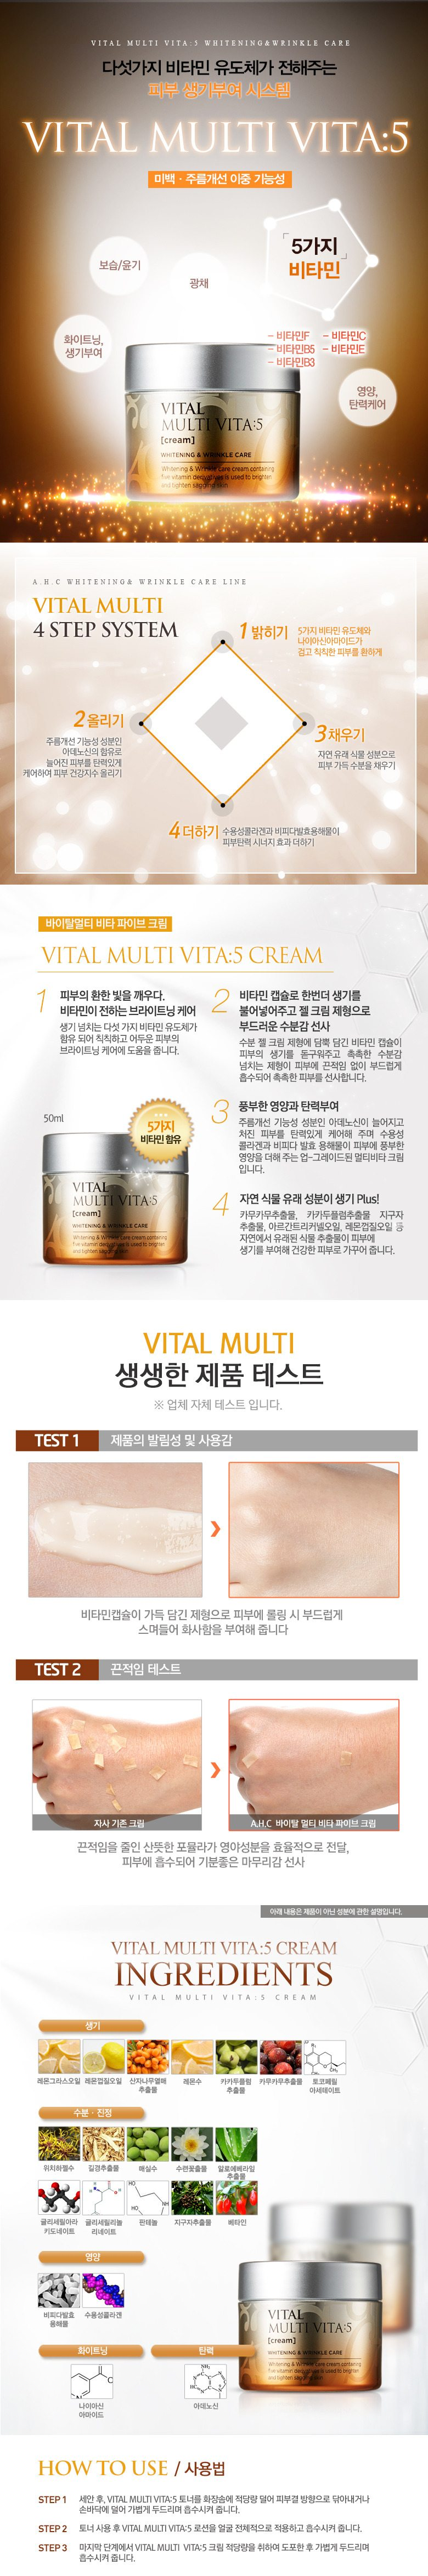 AHC Vital Multi Vita 5 Cream 50g malaysia singapore indonesia